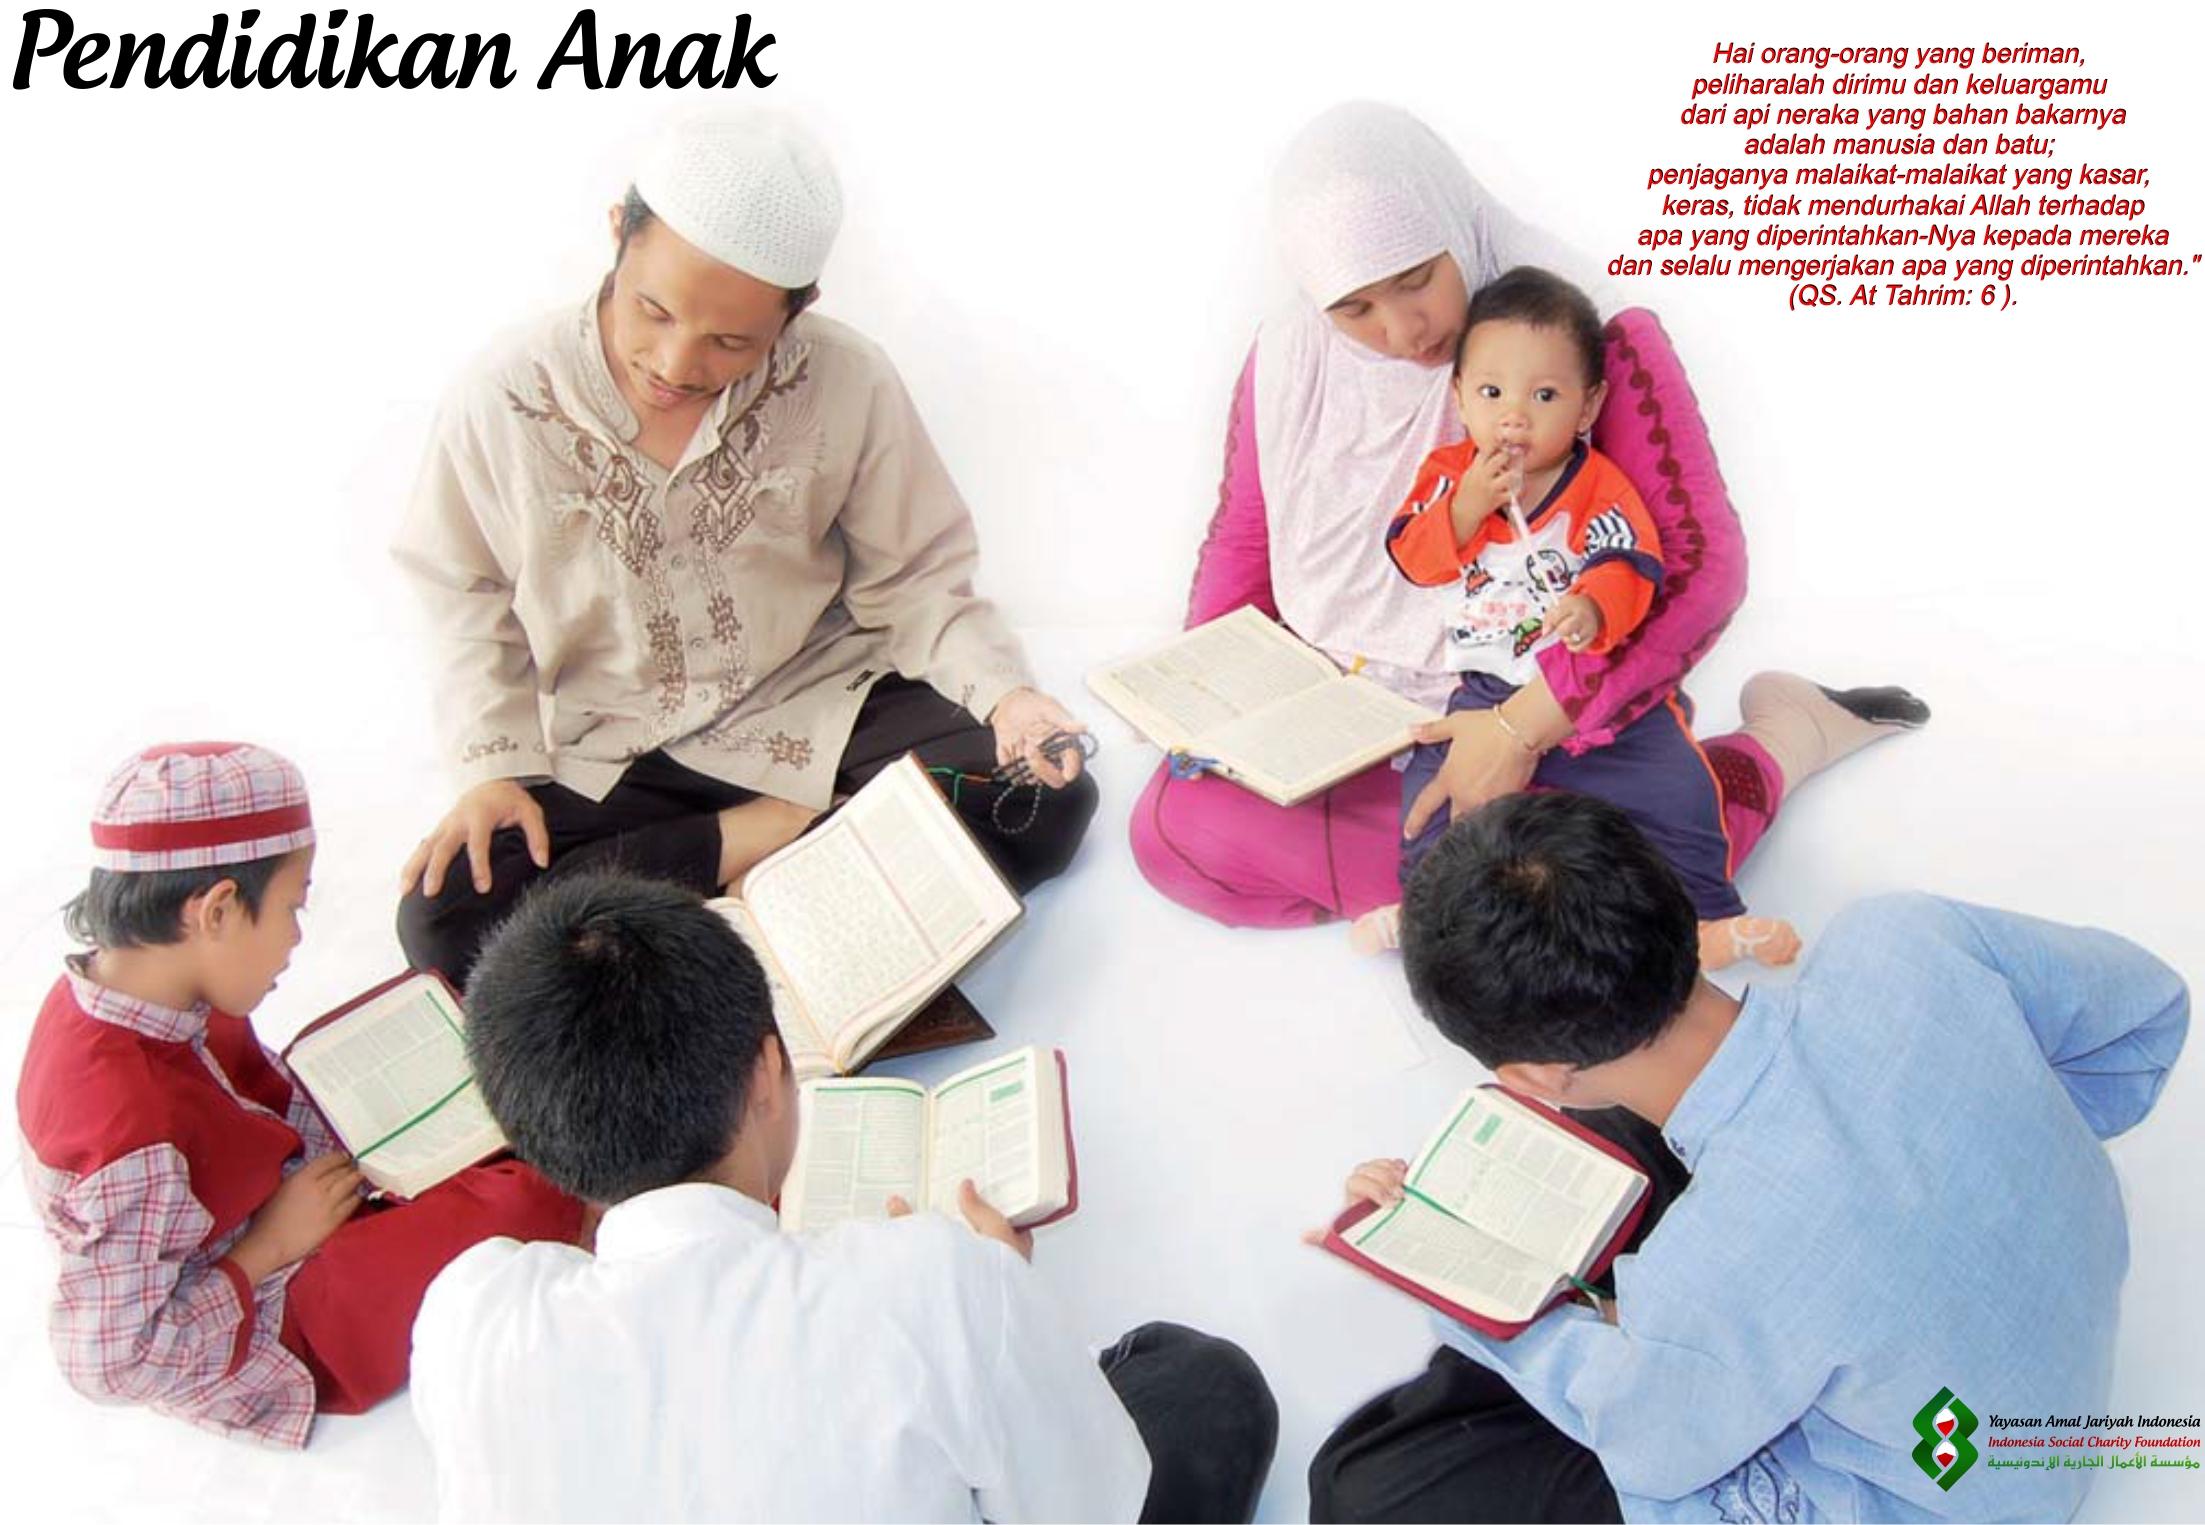 Pendidikan Anak Dalam Islam (Bag.1)